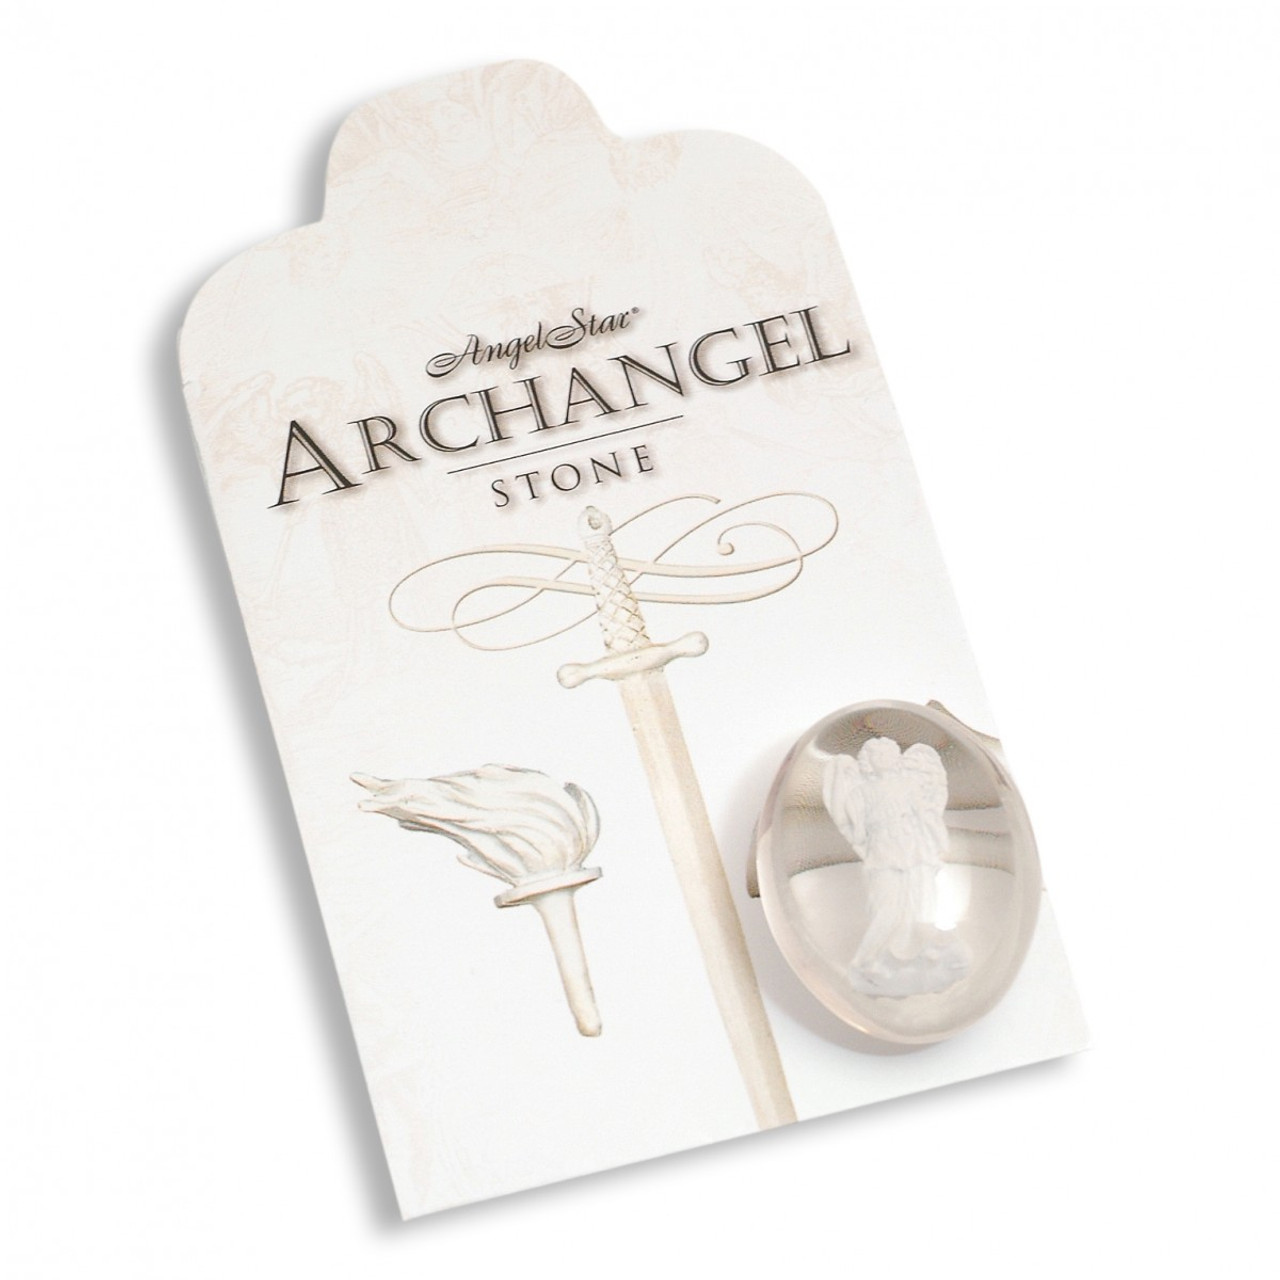 Archangel Stone - Raphael